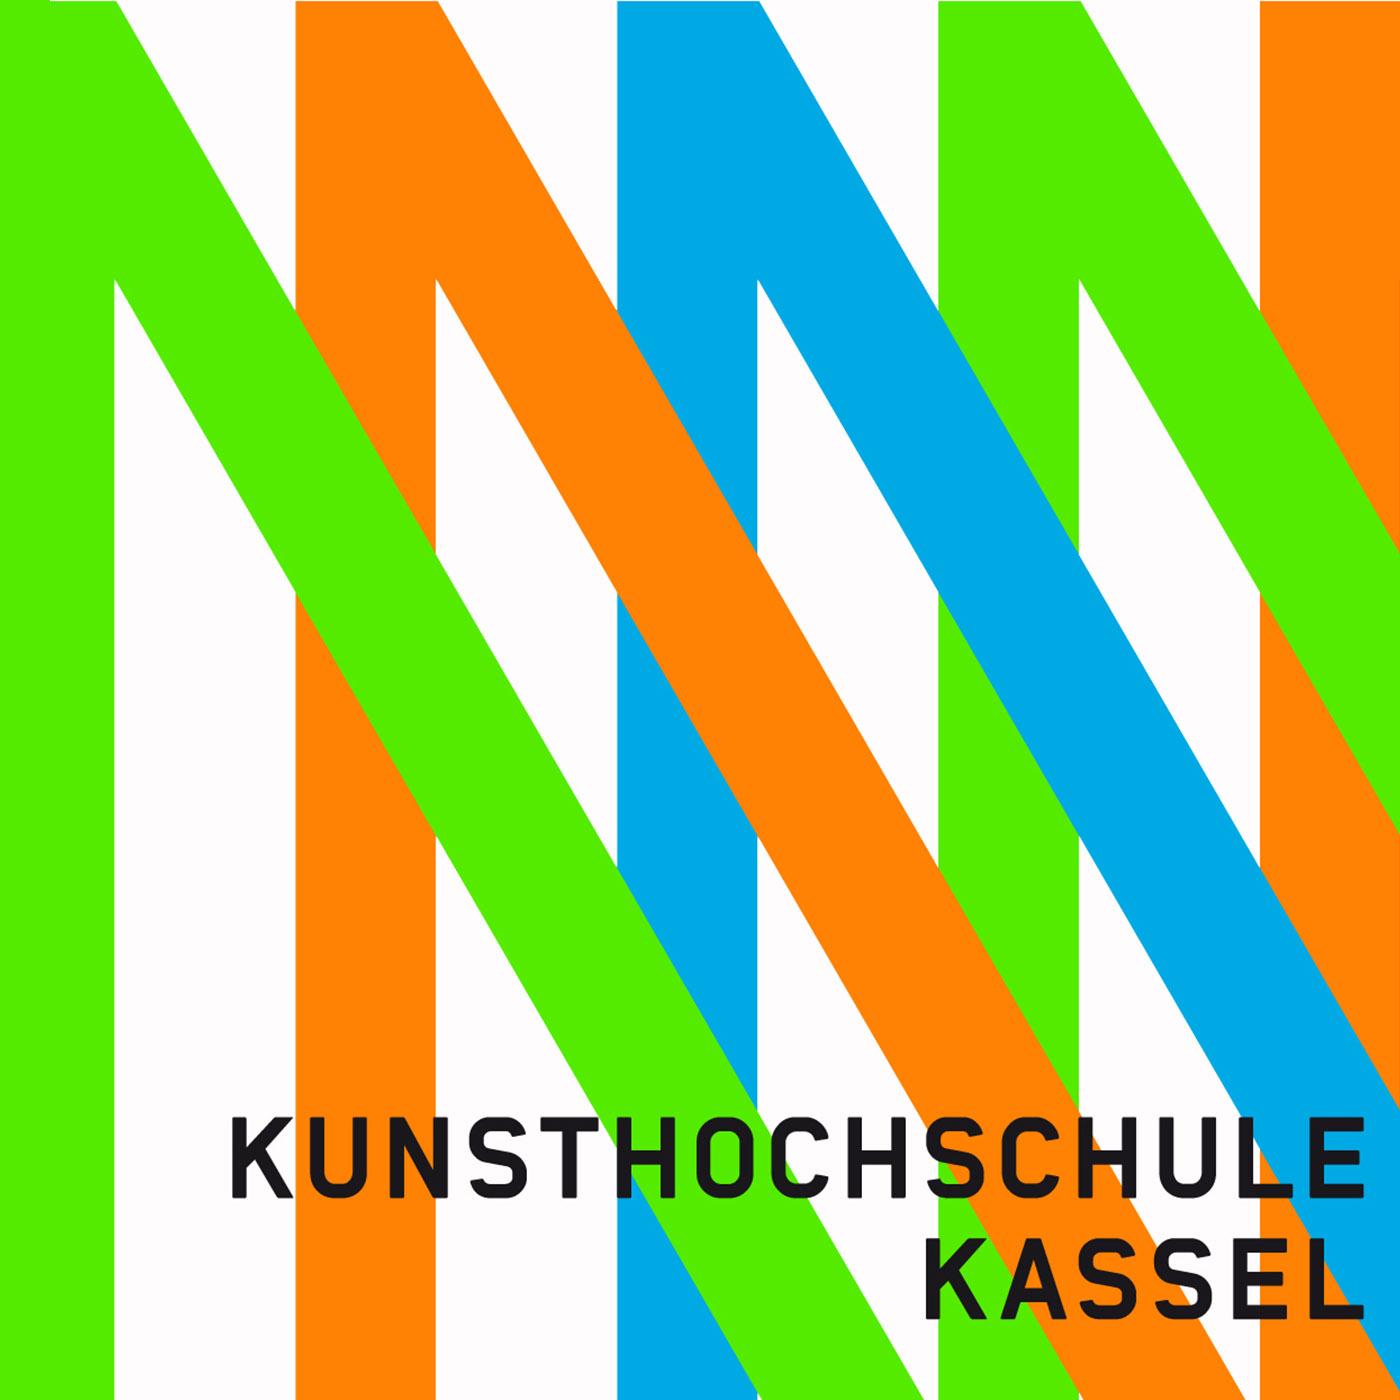 Podcast der Kunsthochschule Kassel